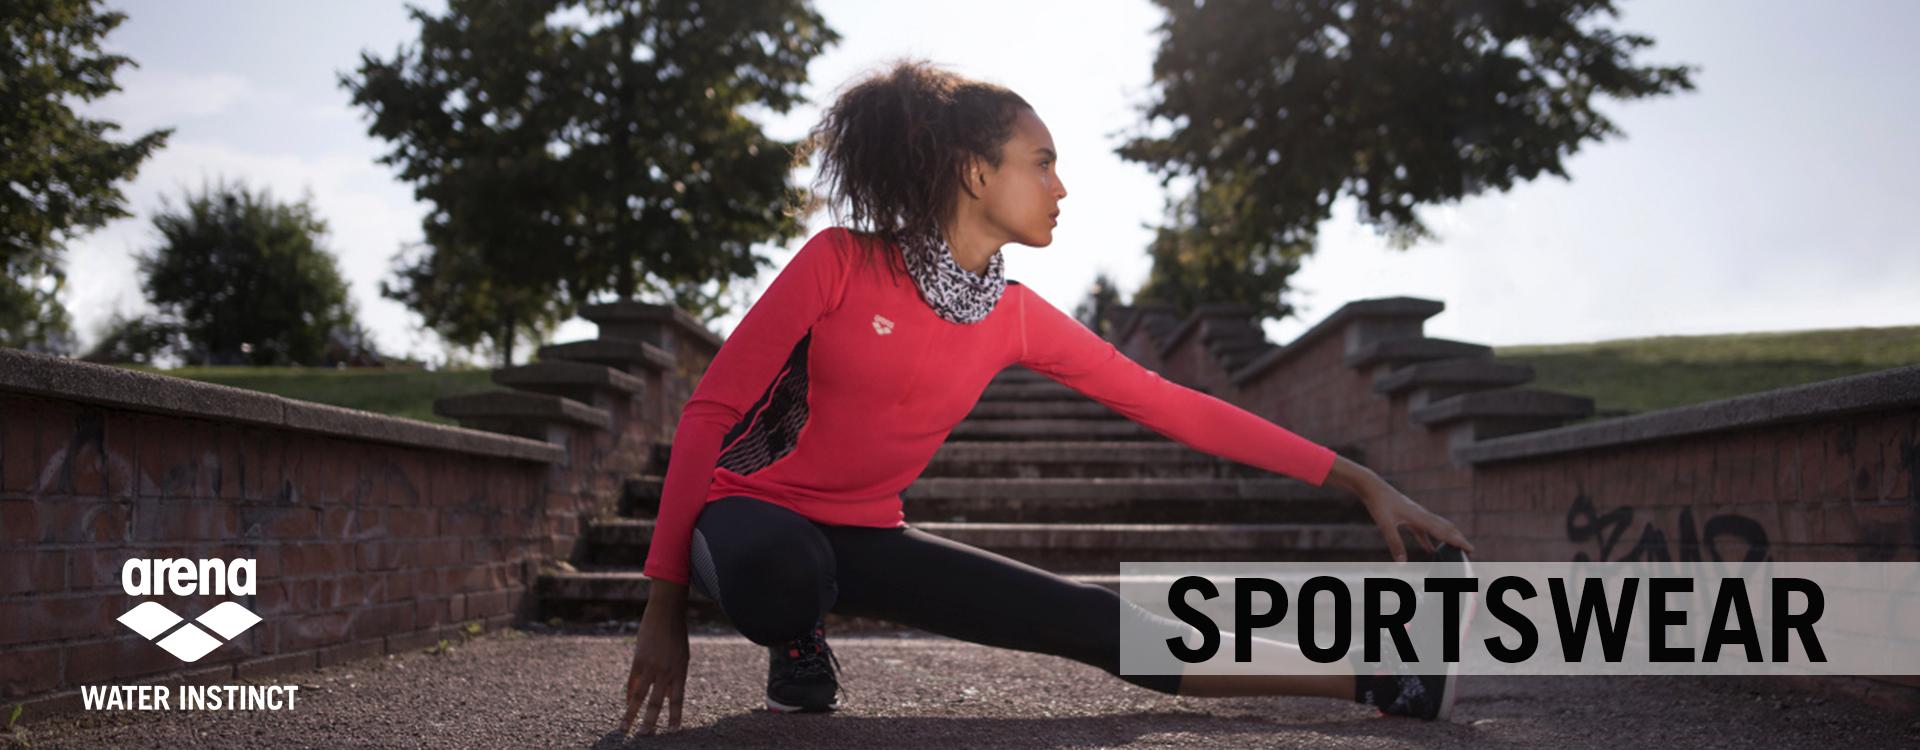 arena water instinct sportswear ropa deportiva para entrenamiento